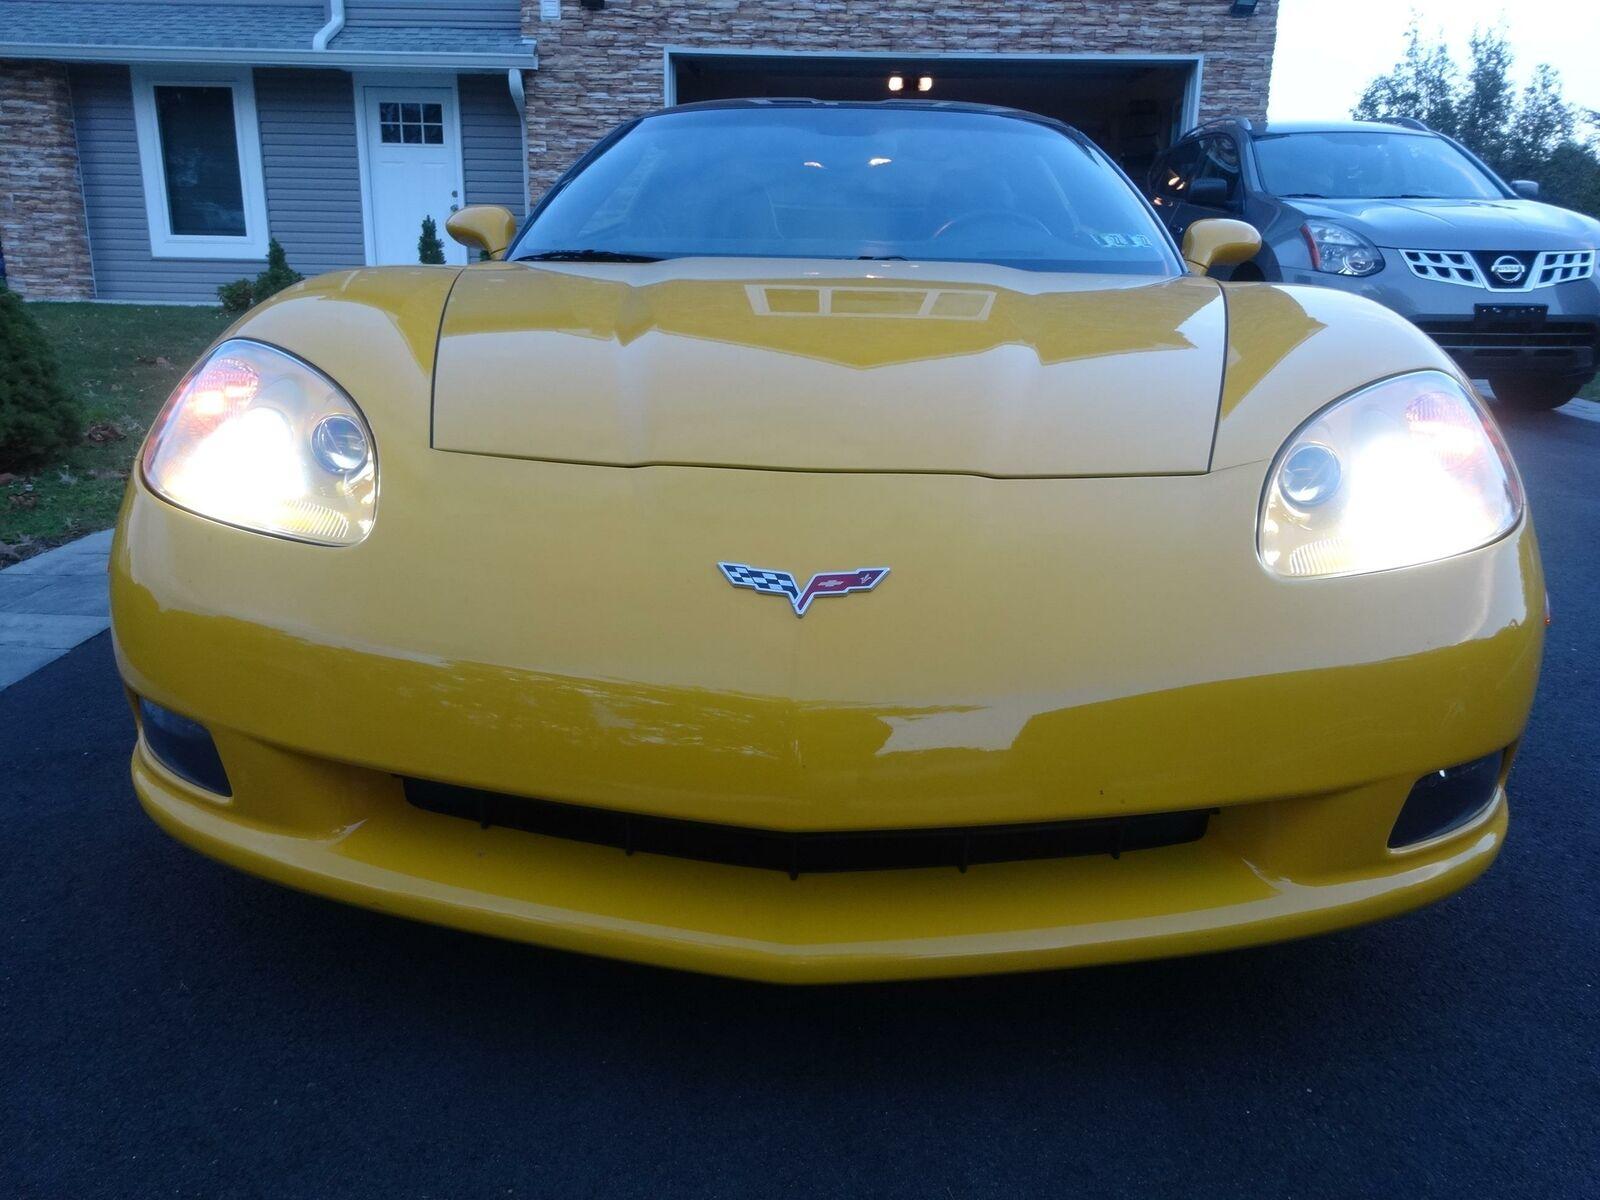 2005 Yellow Chevrolet Corvette     C6 Corvette Photo 7